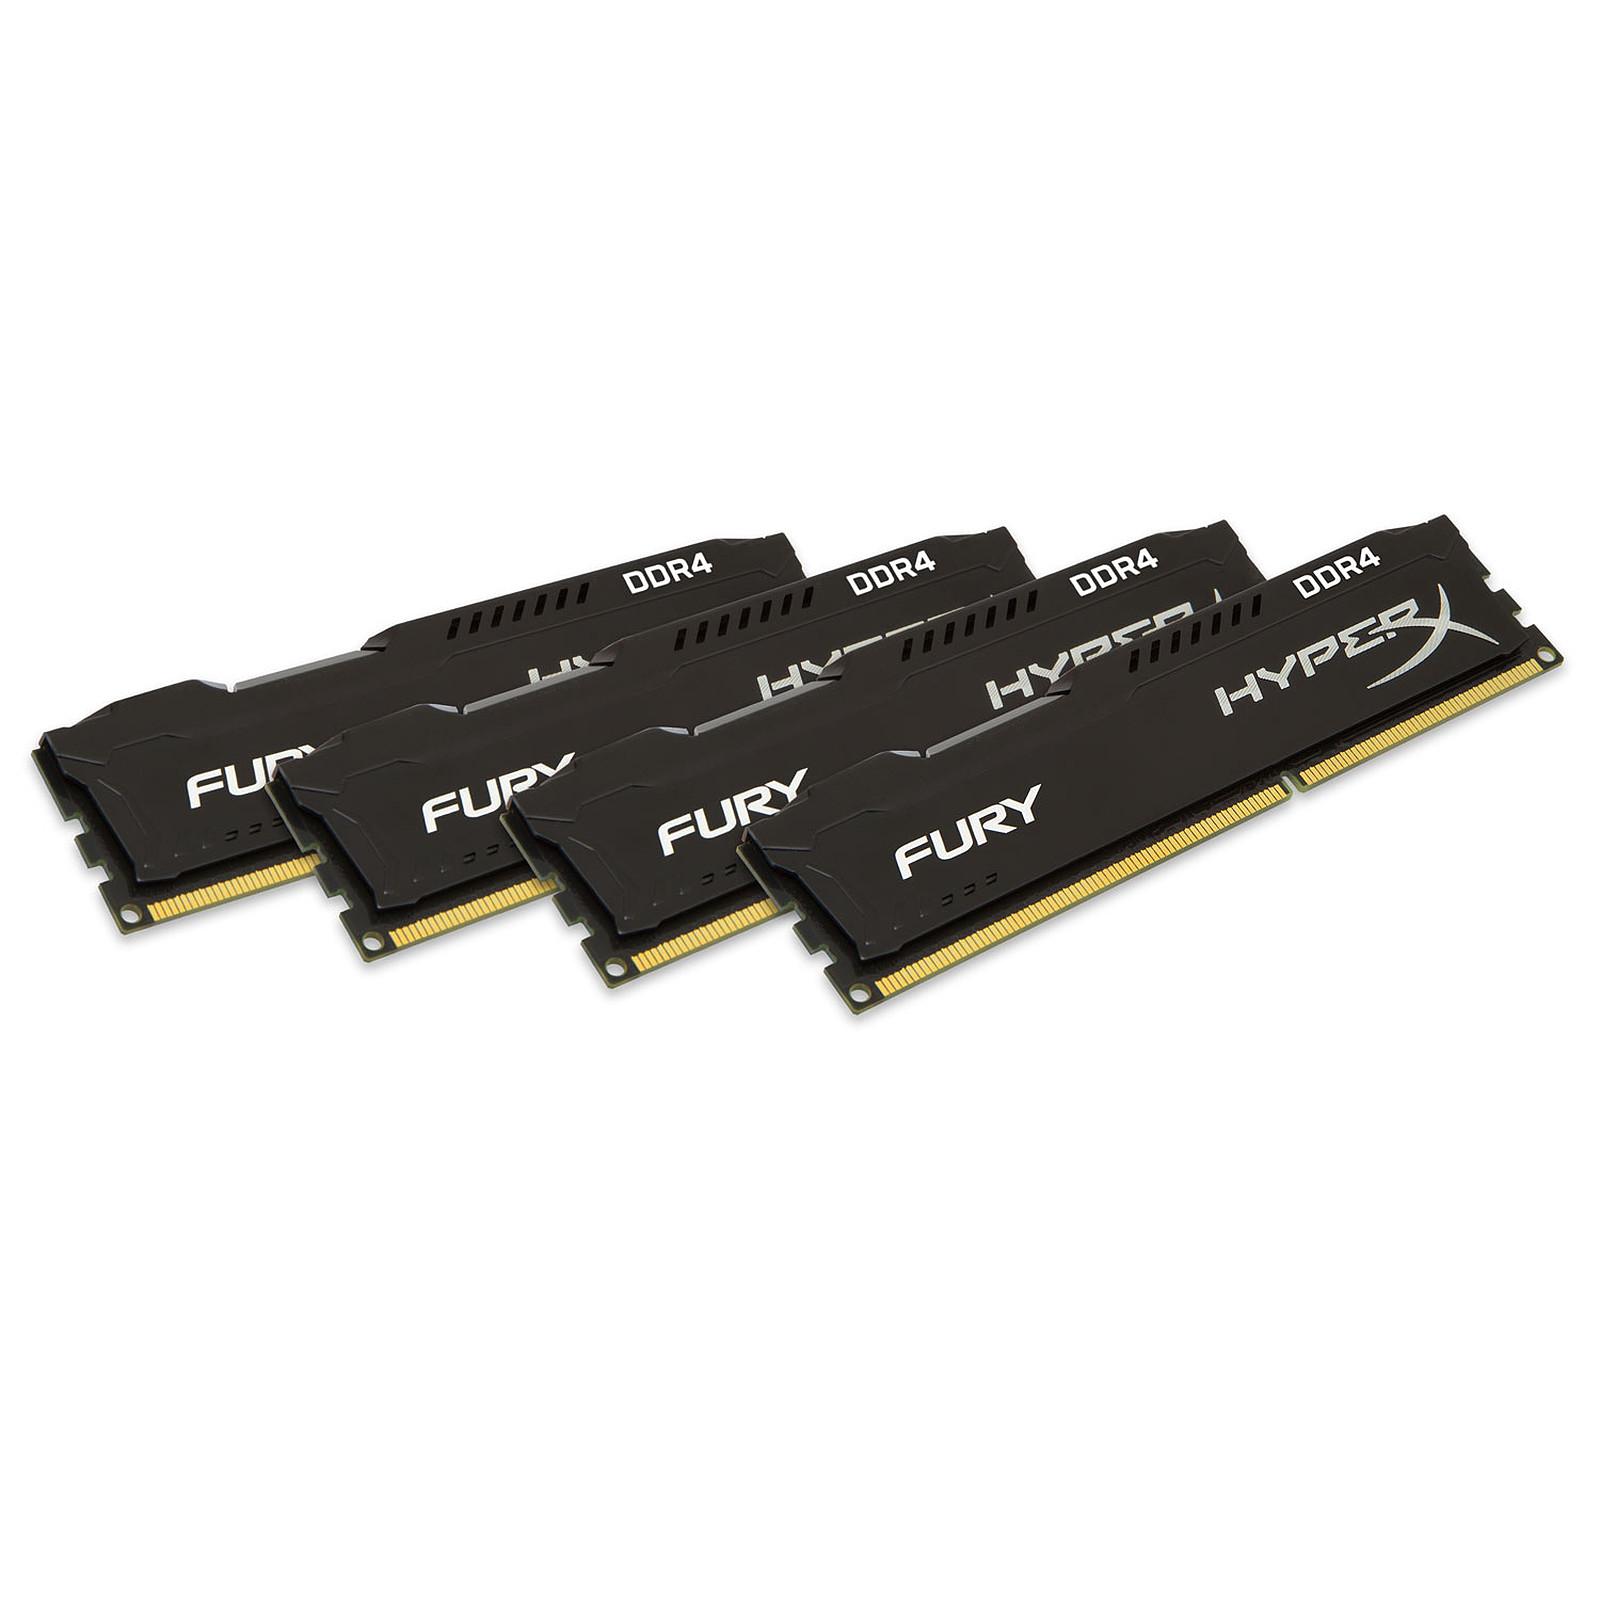 HyperX Fury Noir 32 Go (4x 8 Go) DDR4 2666 MHz CL15